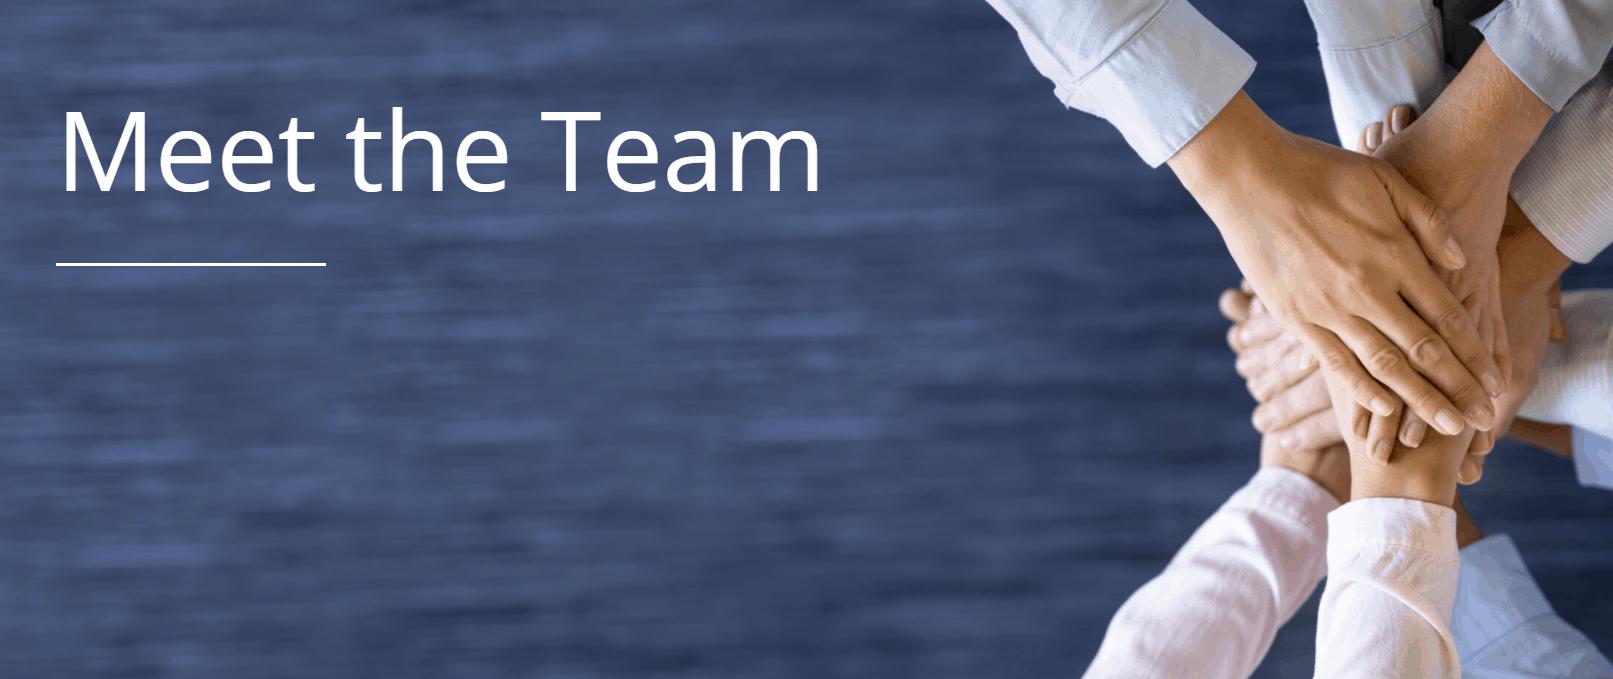 Meet the Team Mobile